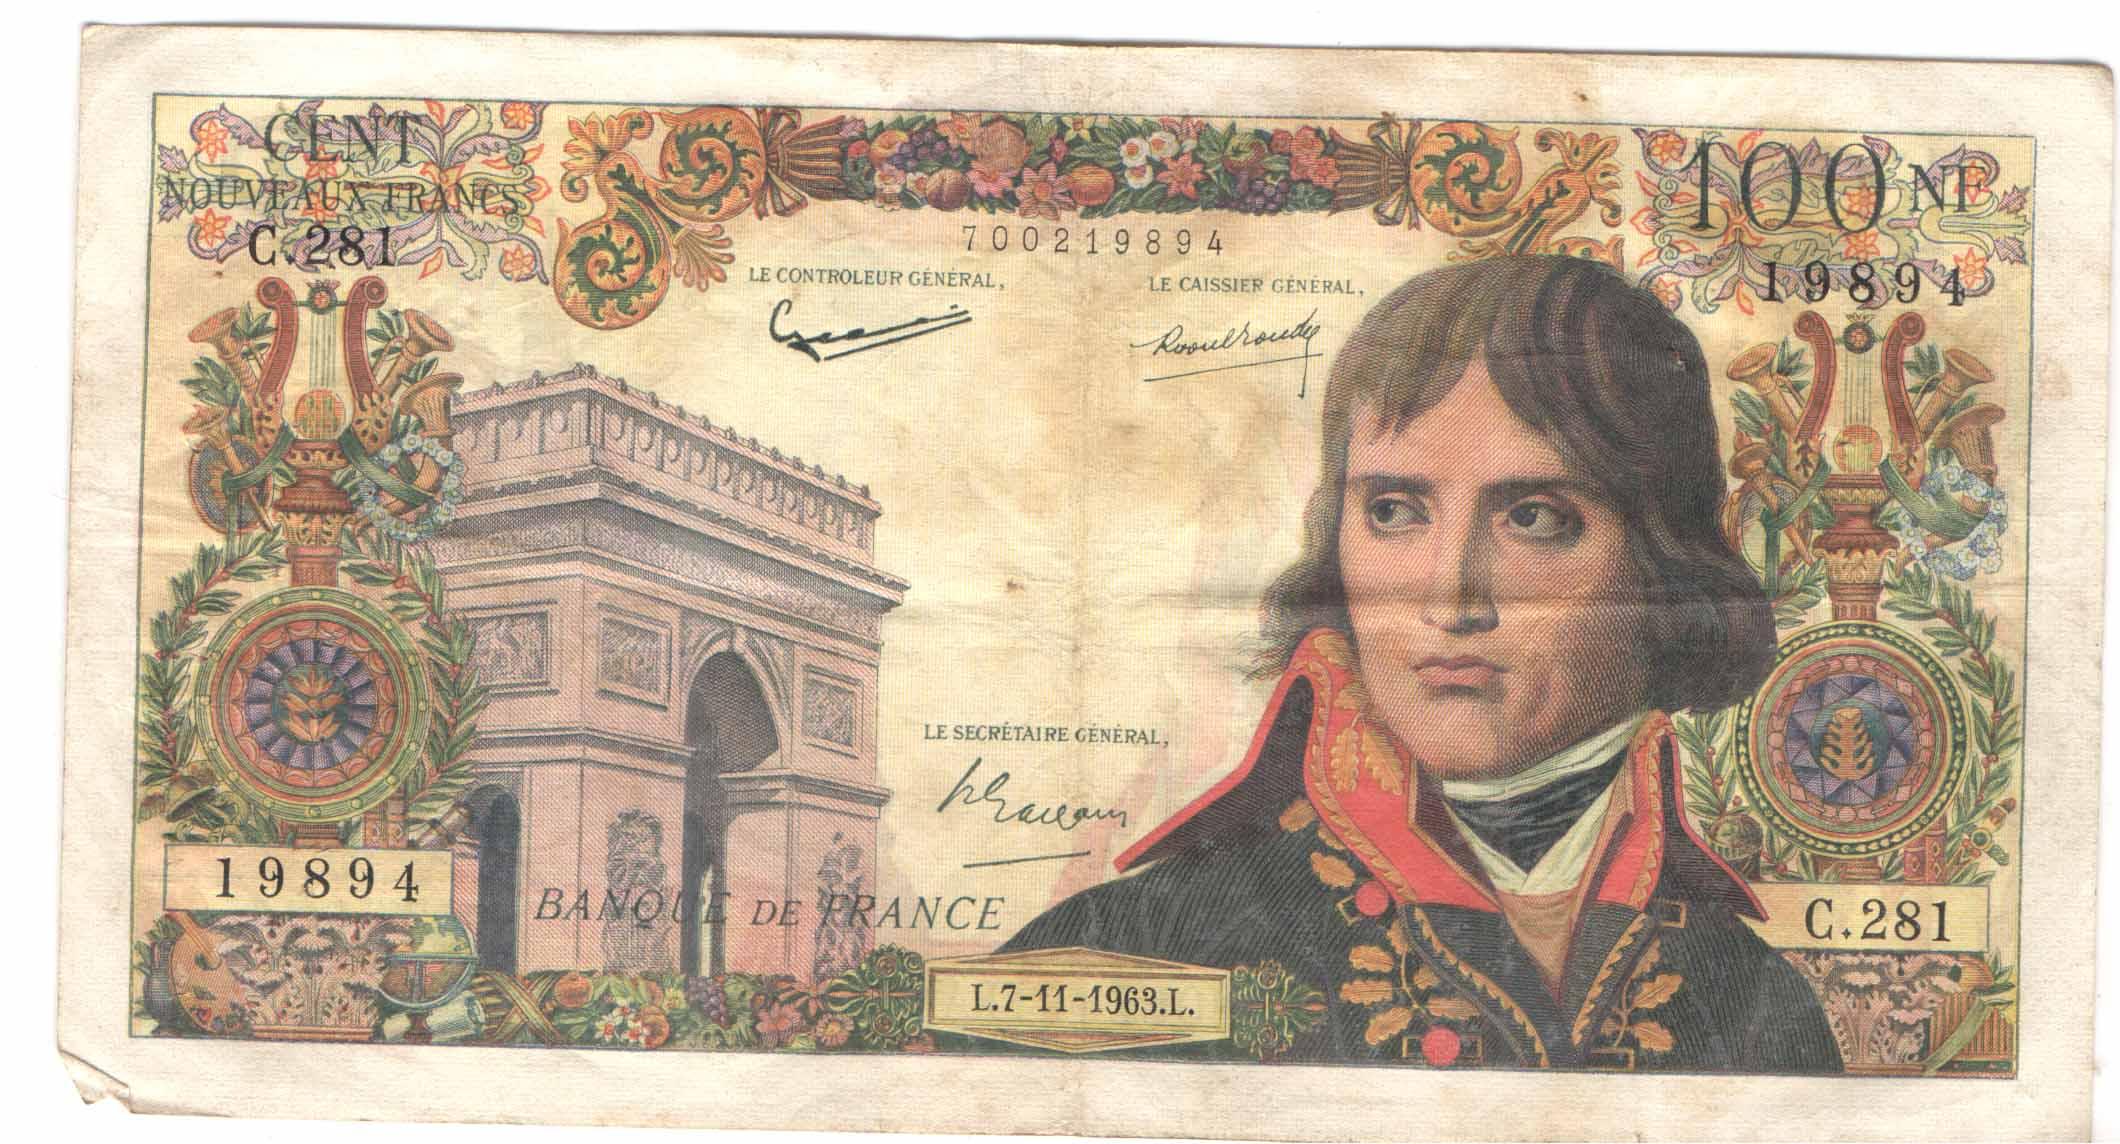 https://www.nuggetsfactory.com/EURO/billet/france/308%20billet%20france.jpg